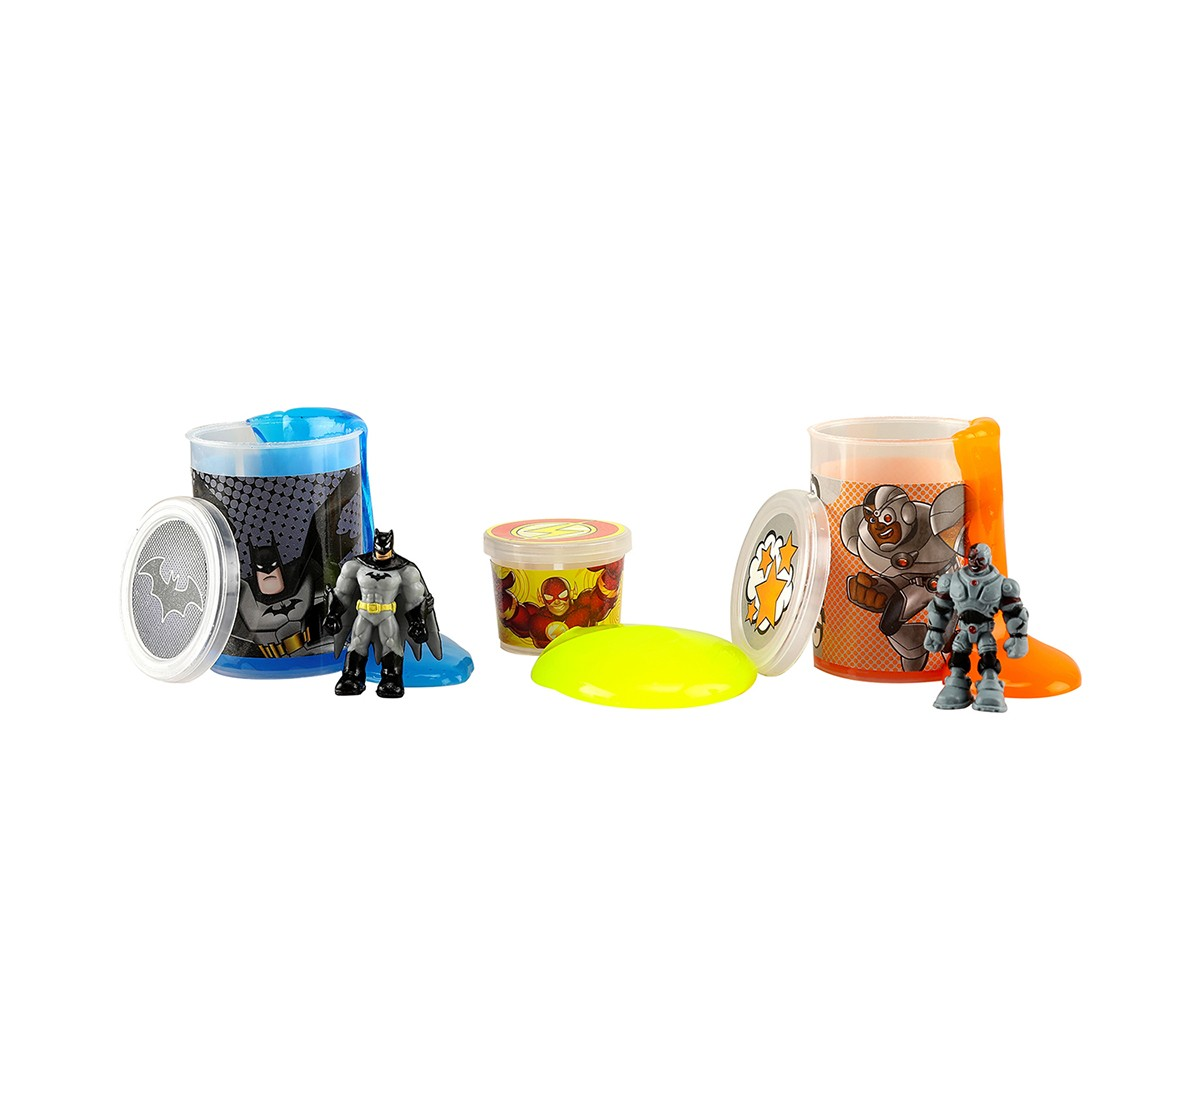 DC Super Friends Batman & Cyborg Slime Mix with 2 Liquid & 1 Jelly Slime